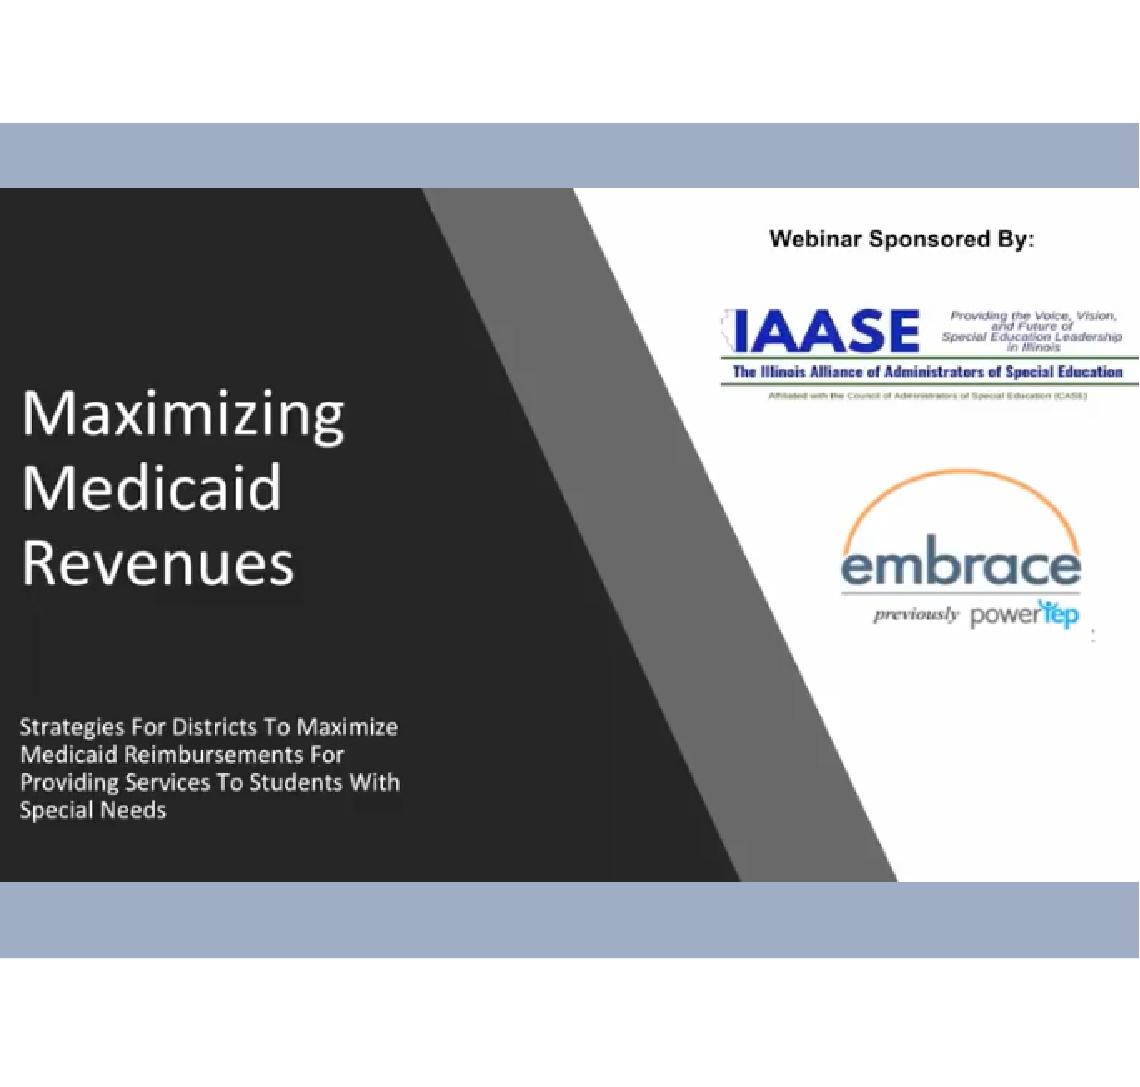 maximizing-medicaid-revenues-2